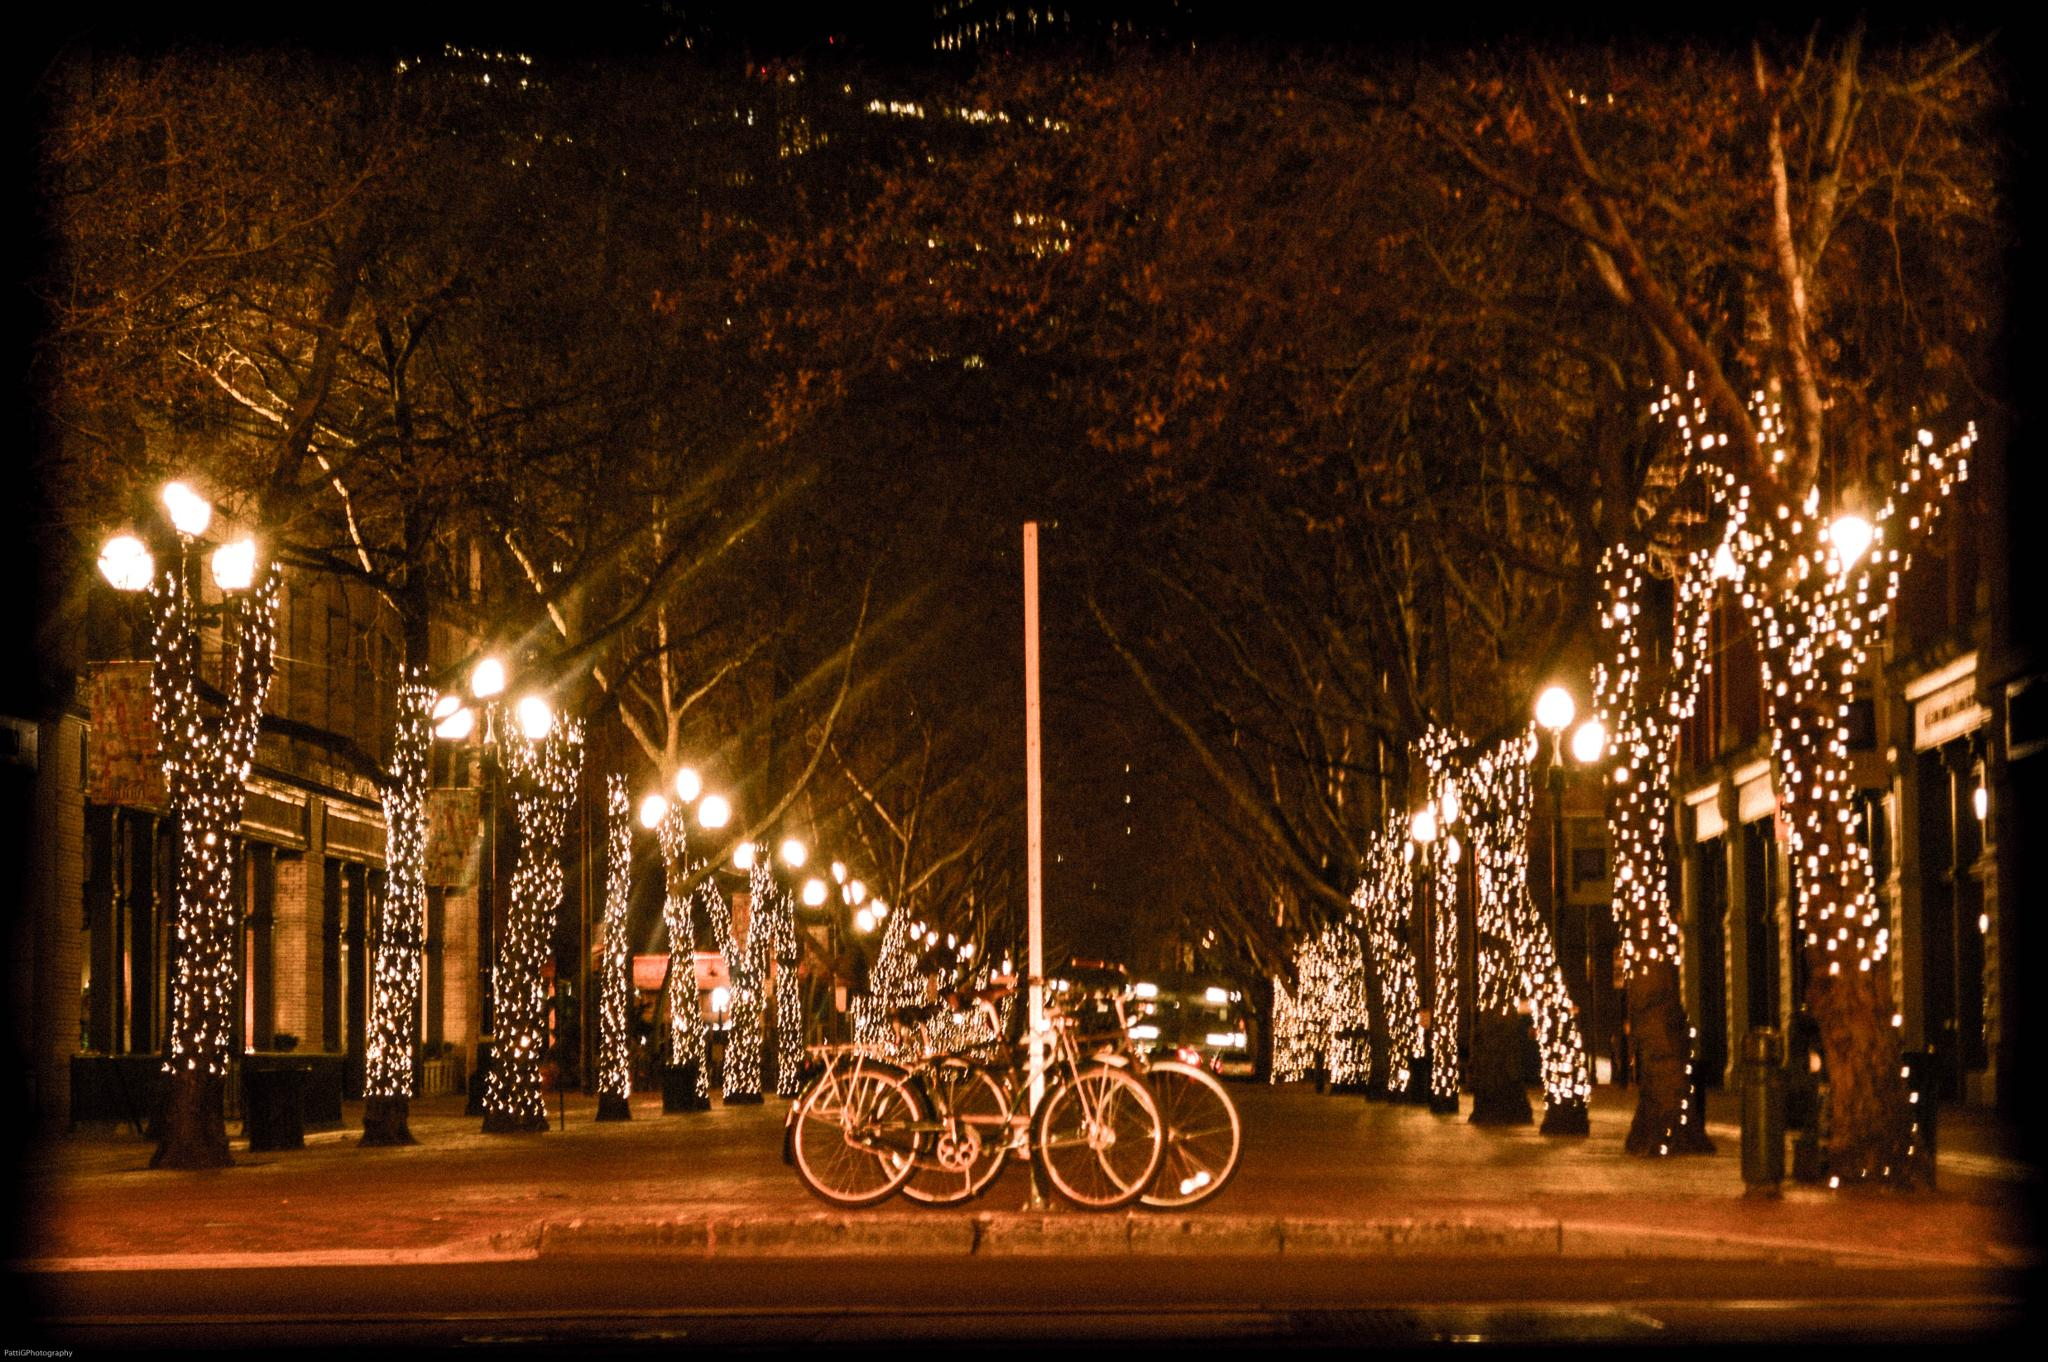 Night Rider by Patti Lin